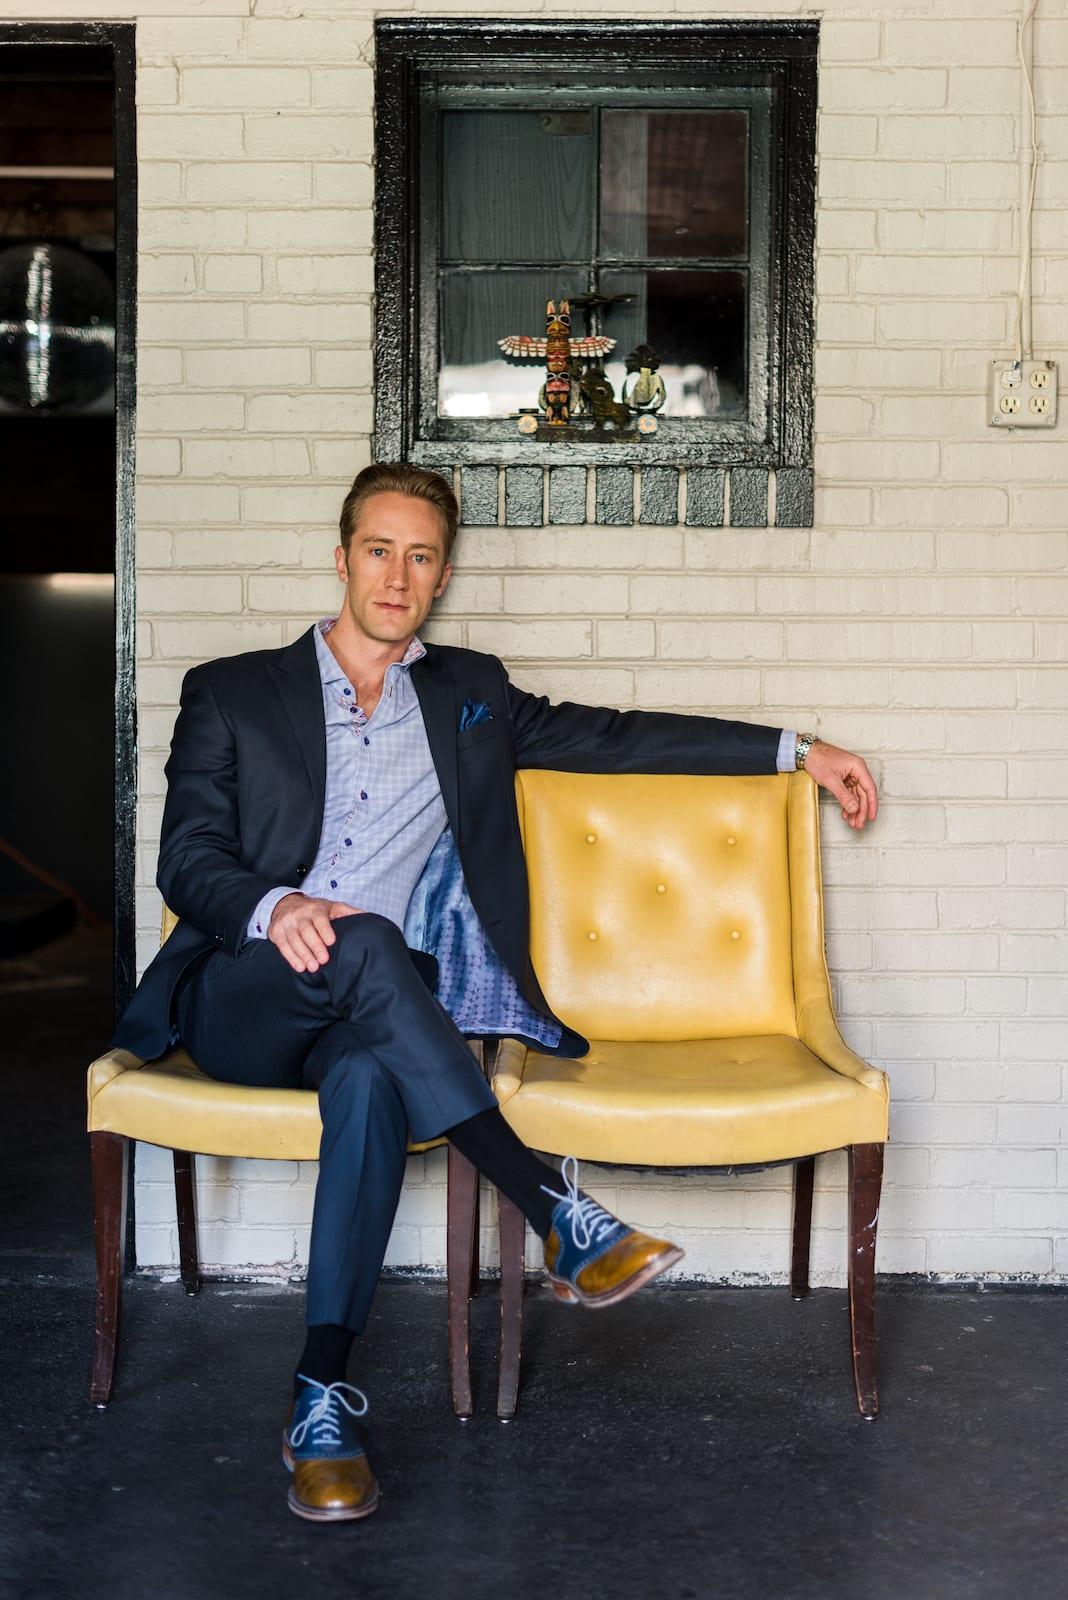 Professional Headshot | Portrait | Denver | From the Hip Photo